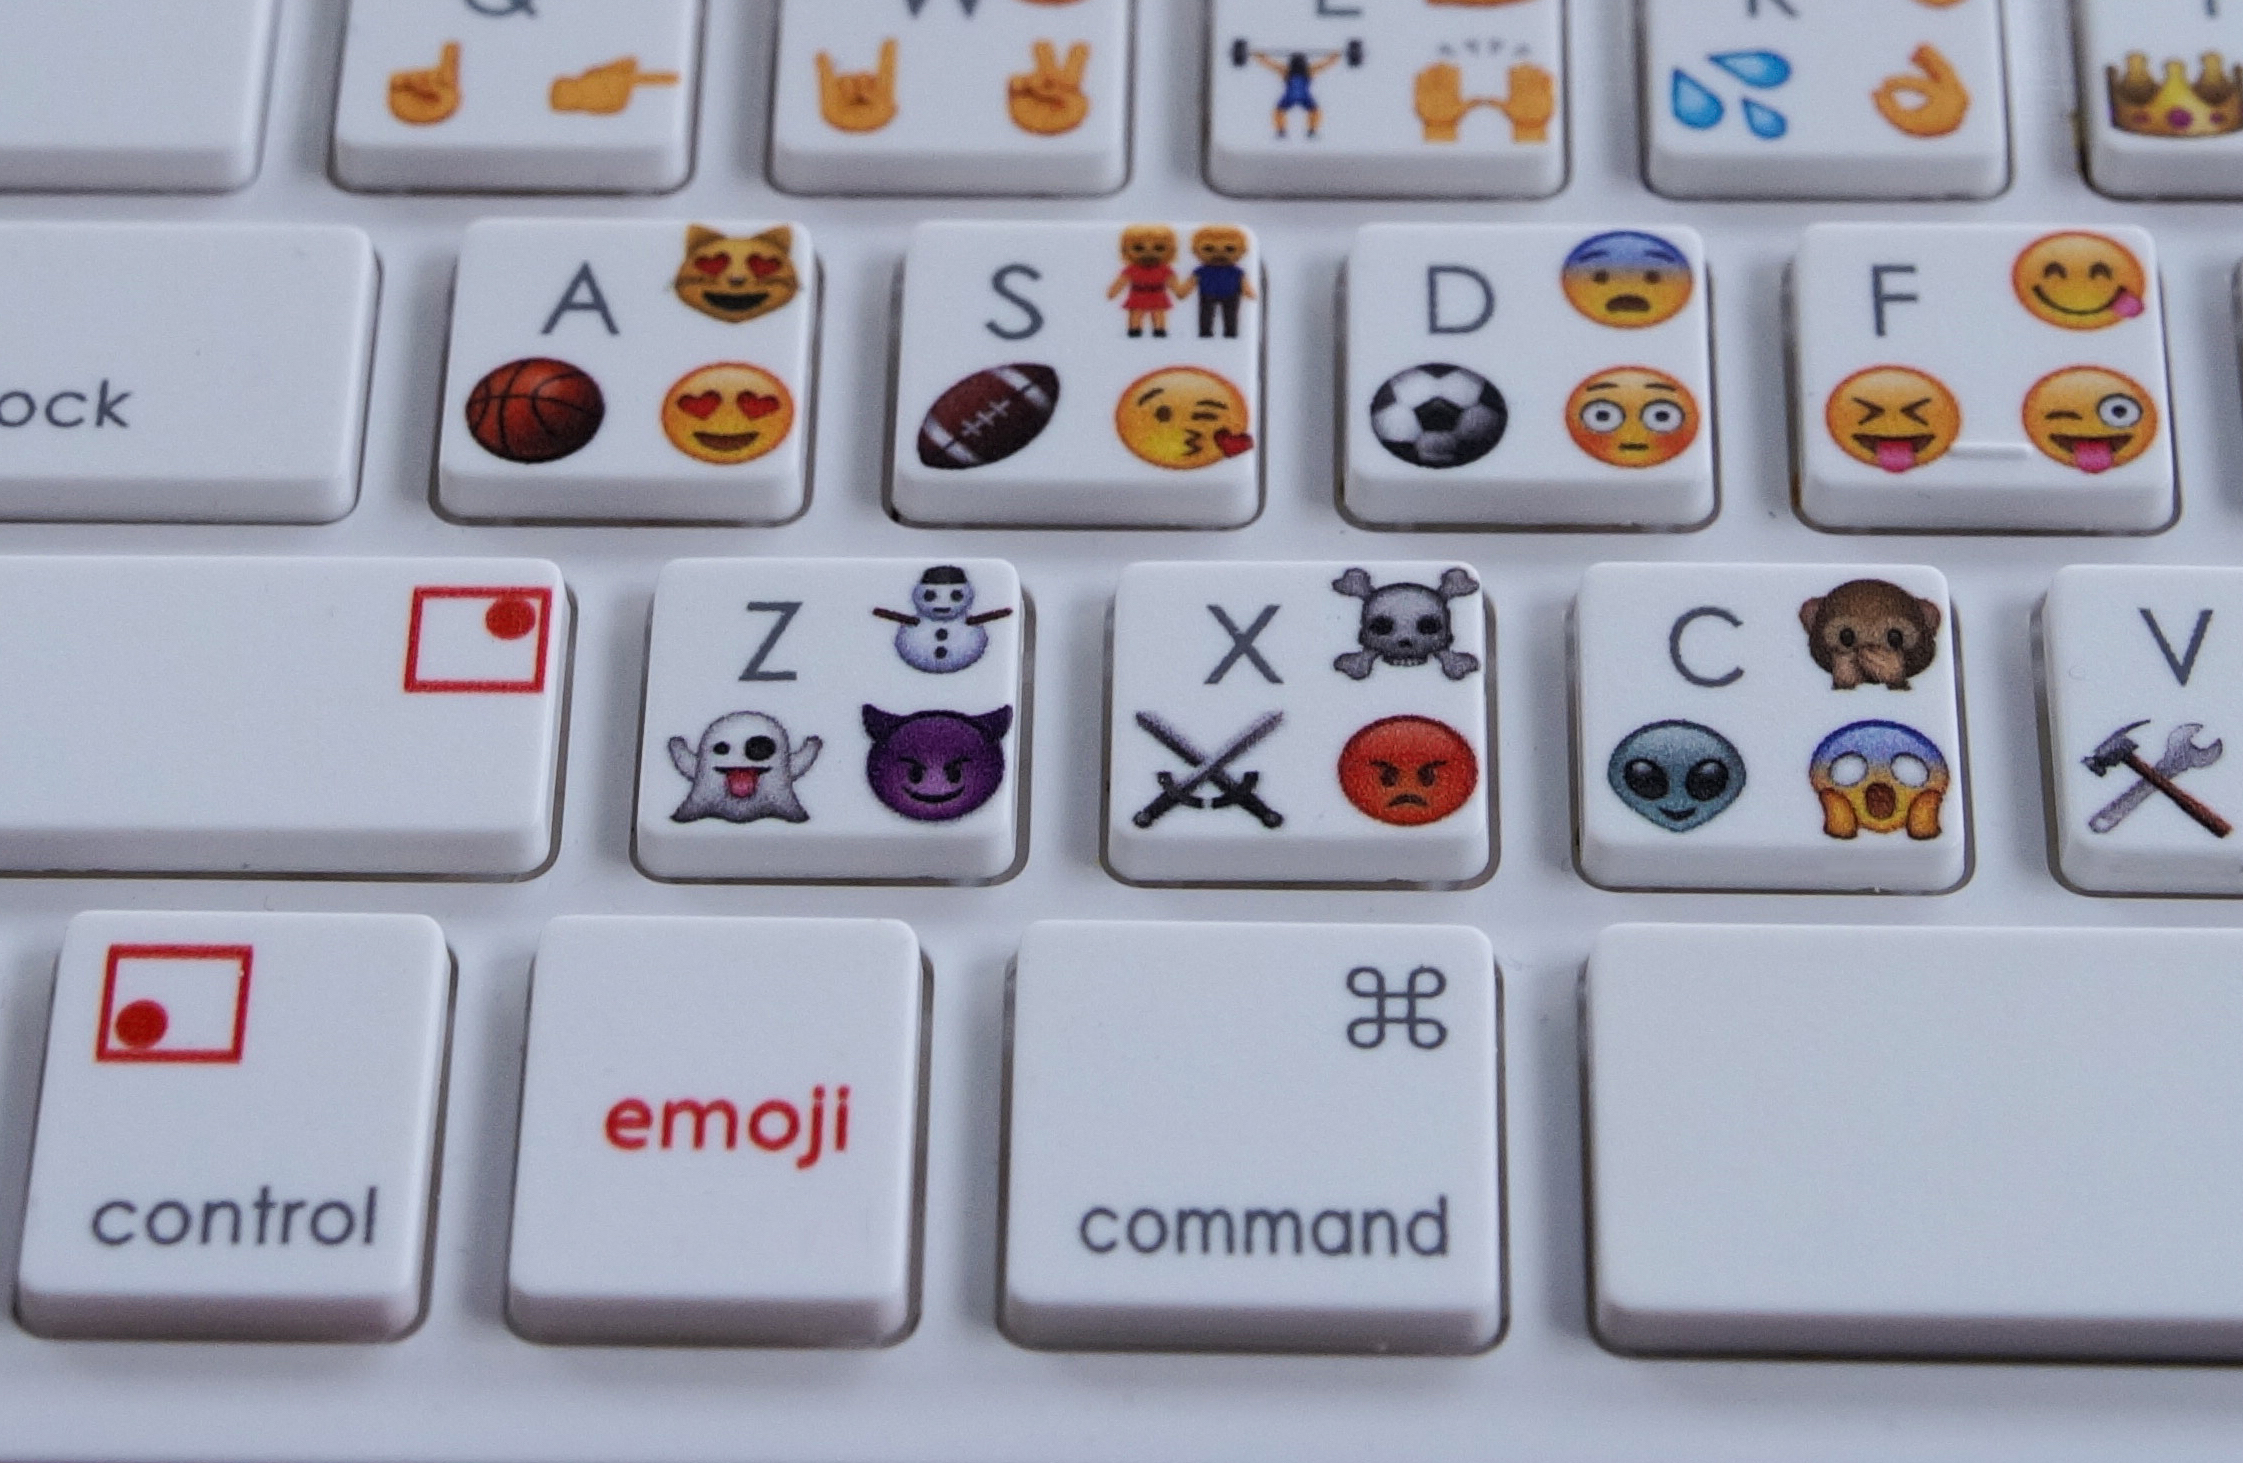 Emoji Keyboards put ghosts and smiling poop at your